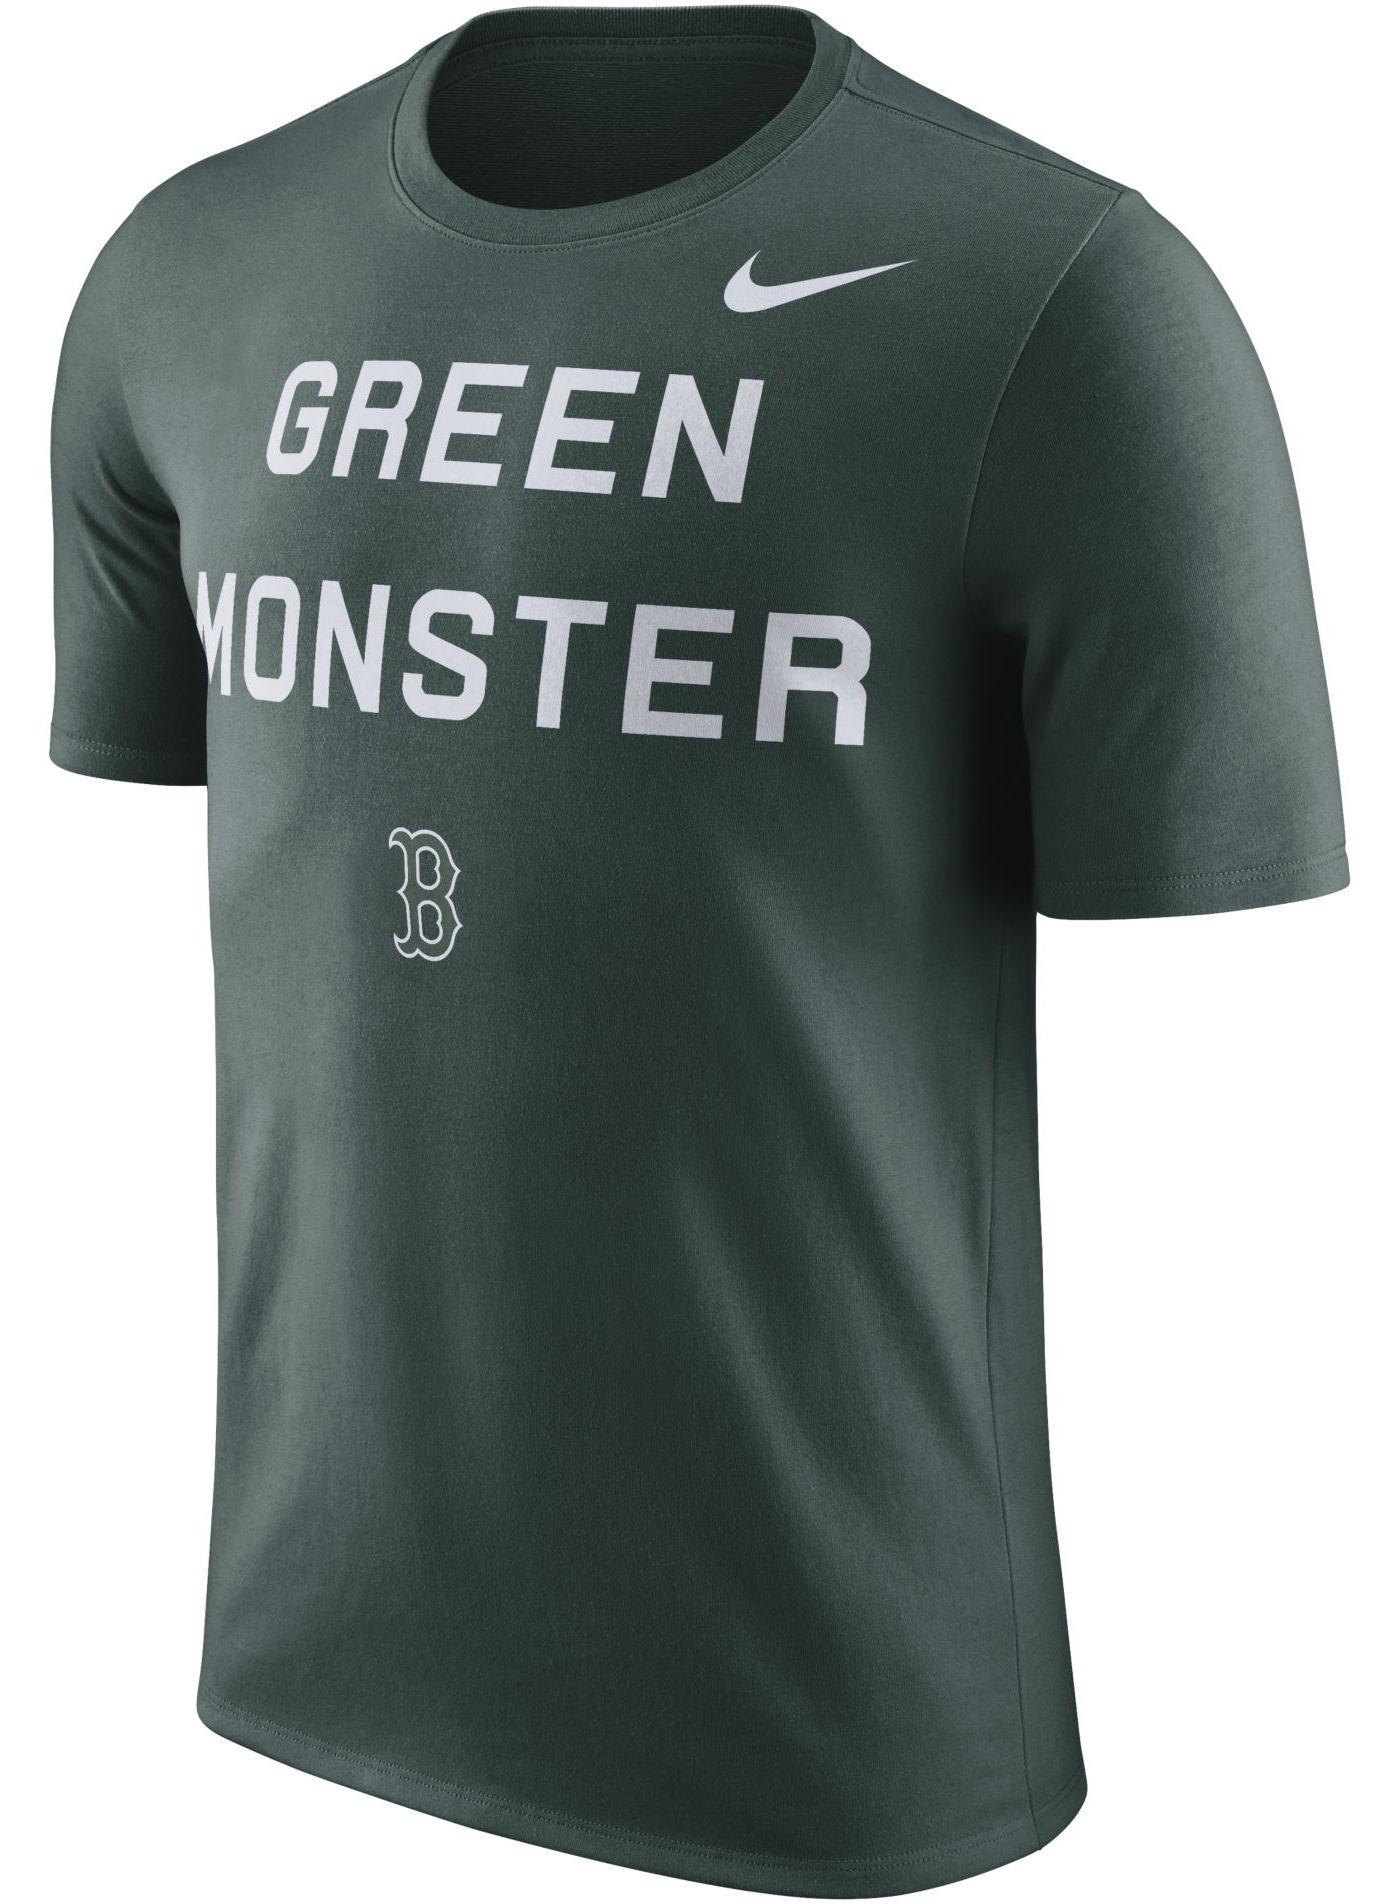 "Nike Men's Boston Red Sox Dri-FIT ""Green Monster"" T-Shirt"